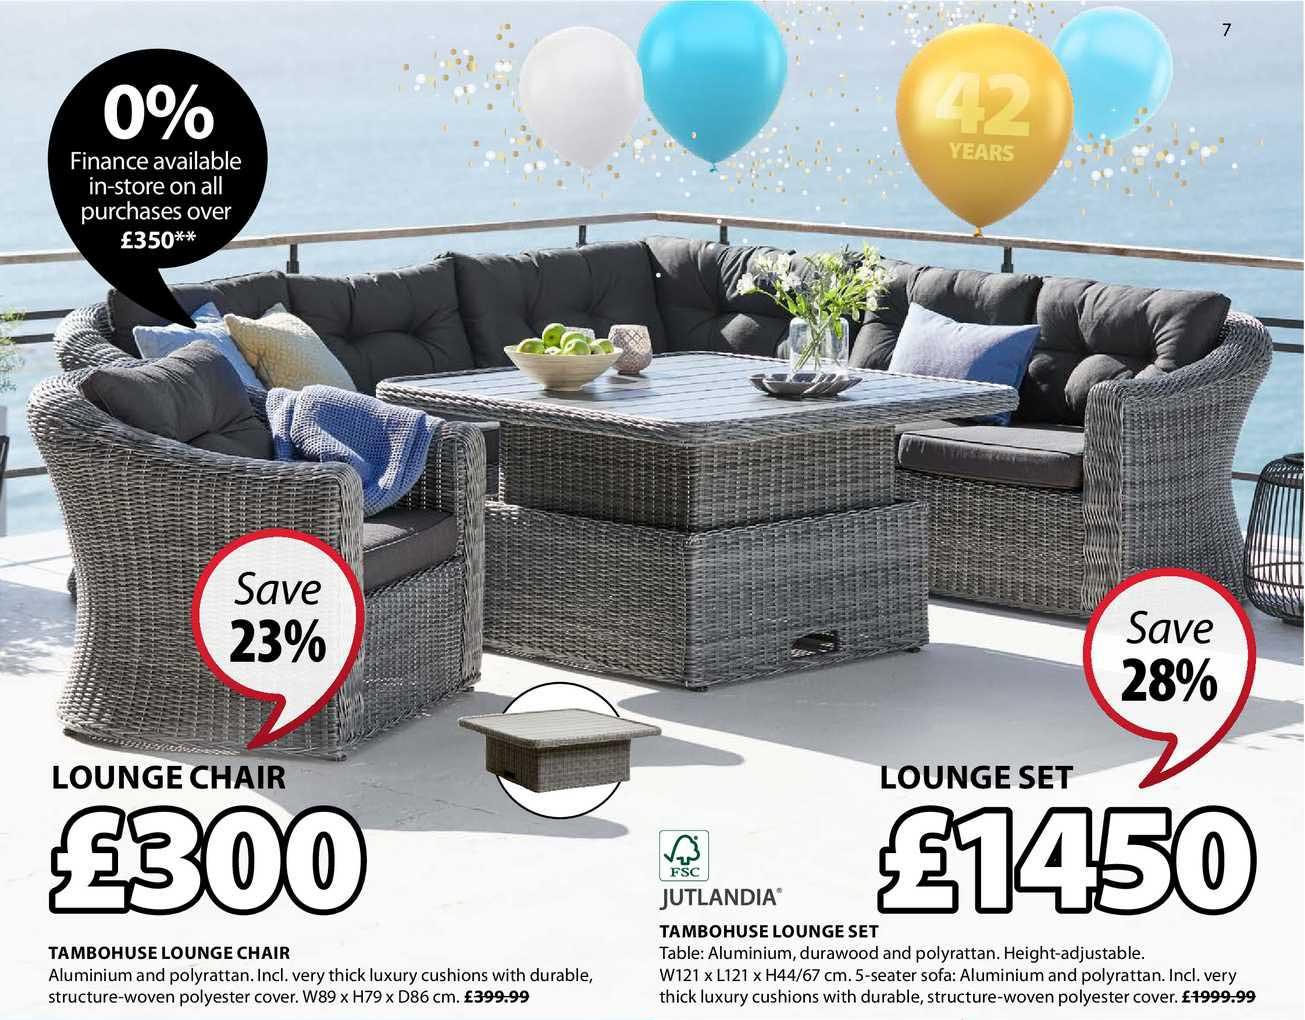 JYSK Tambohuse Lounge Chair , Jutlandia Tambohuse Lounge Set